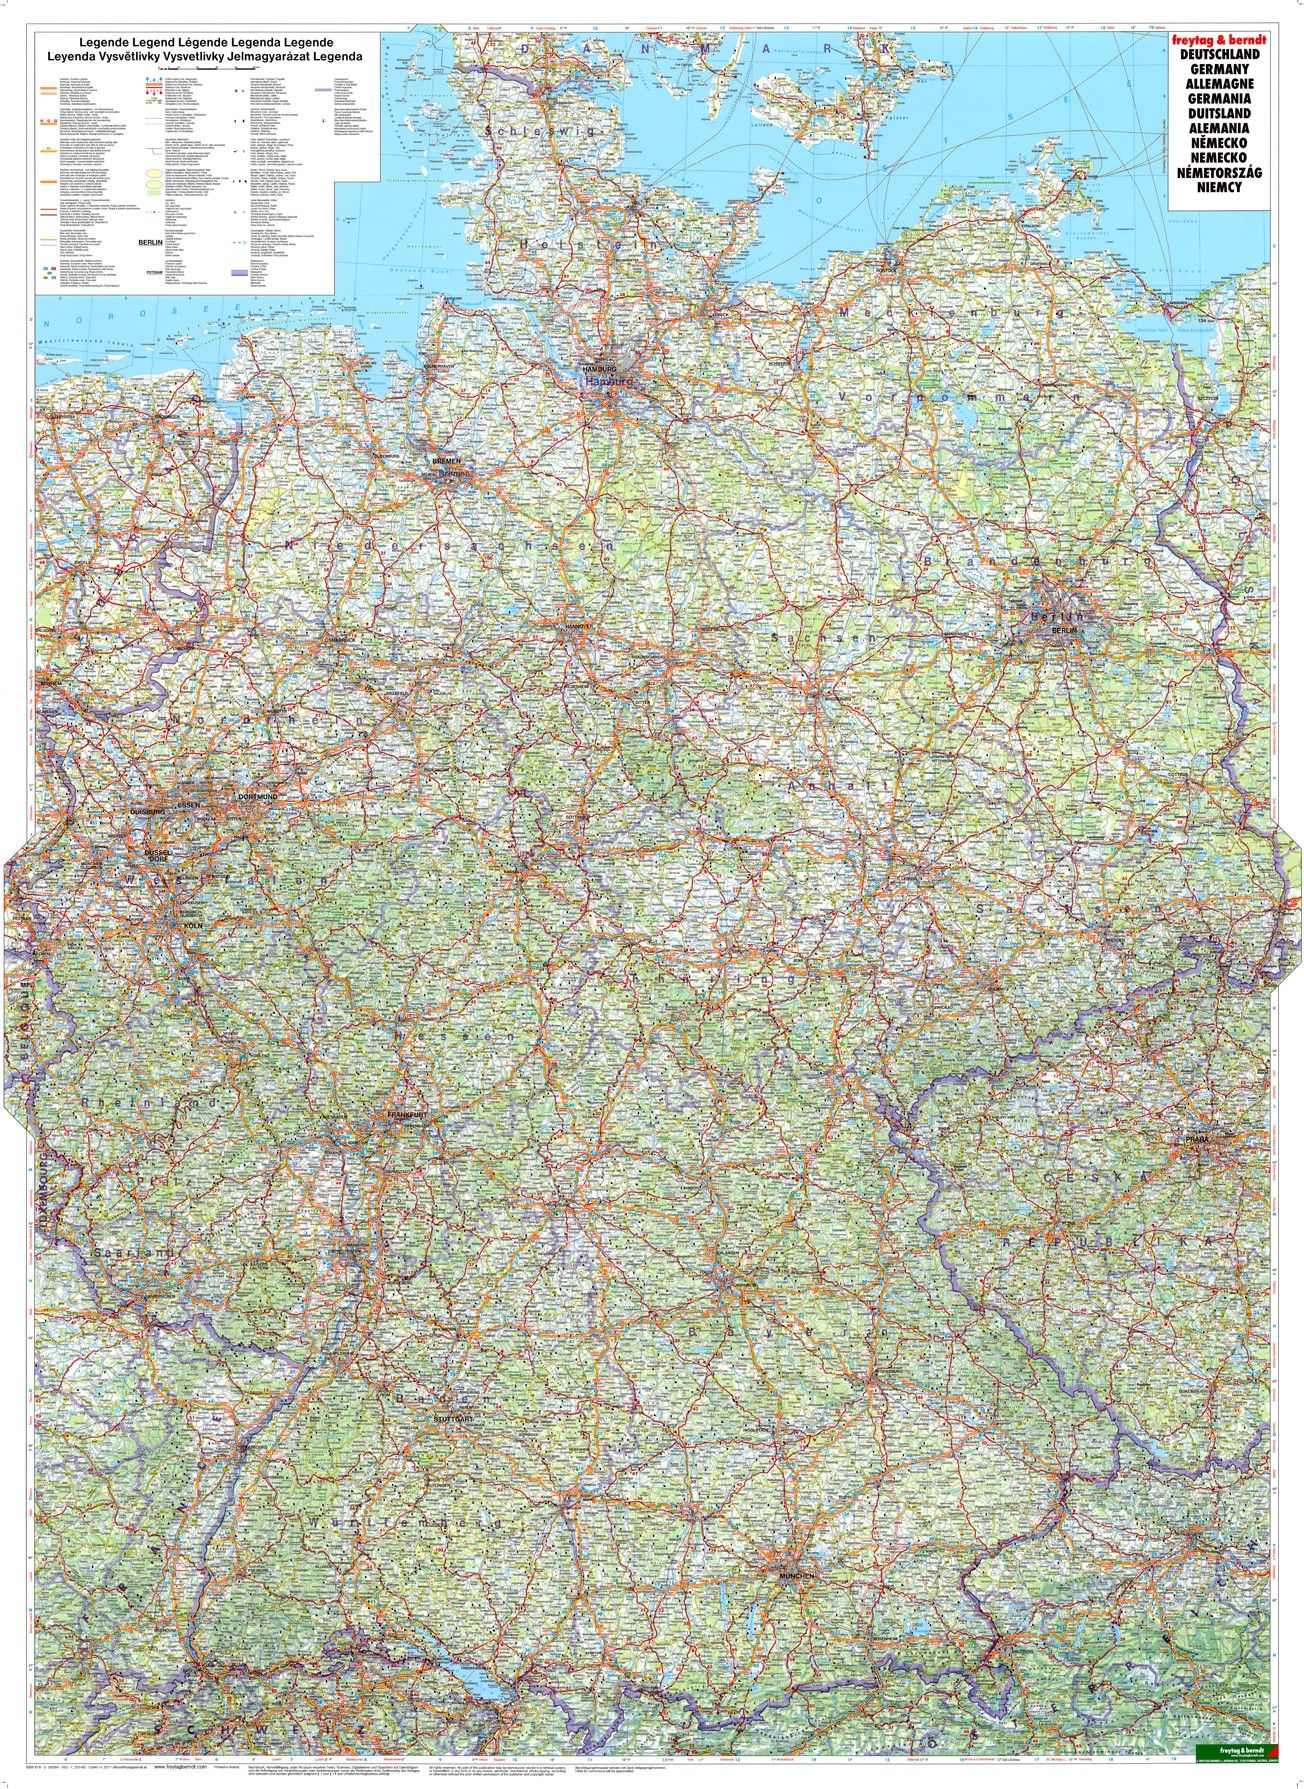 Landkaart Duitsland Groot